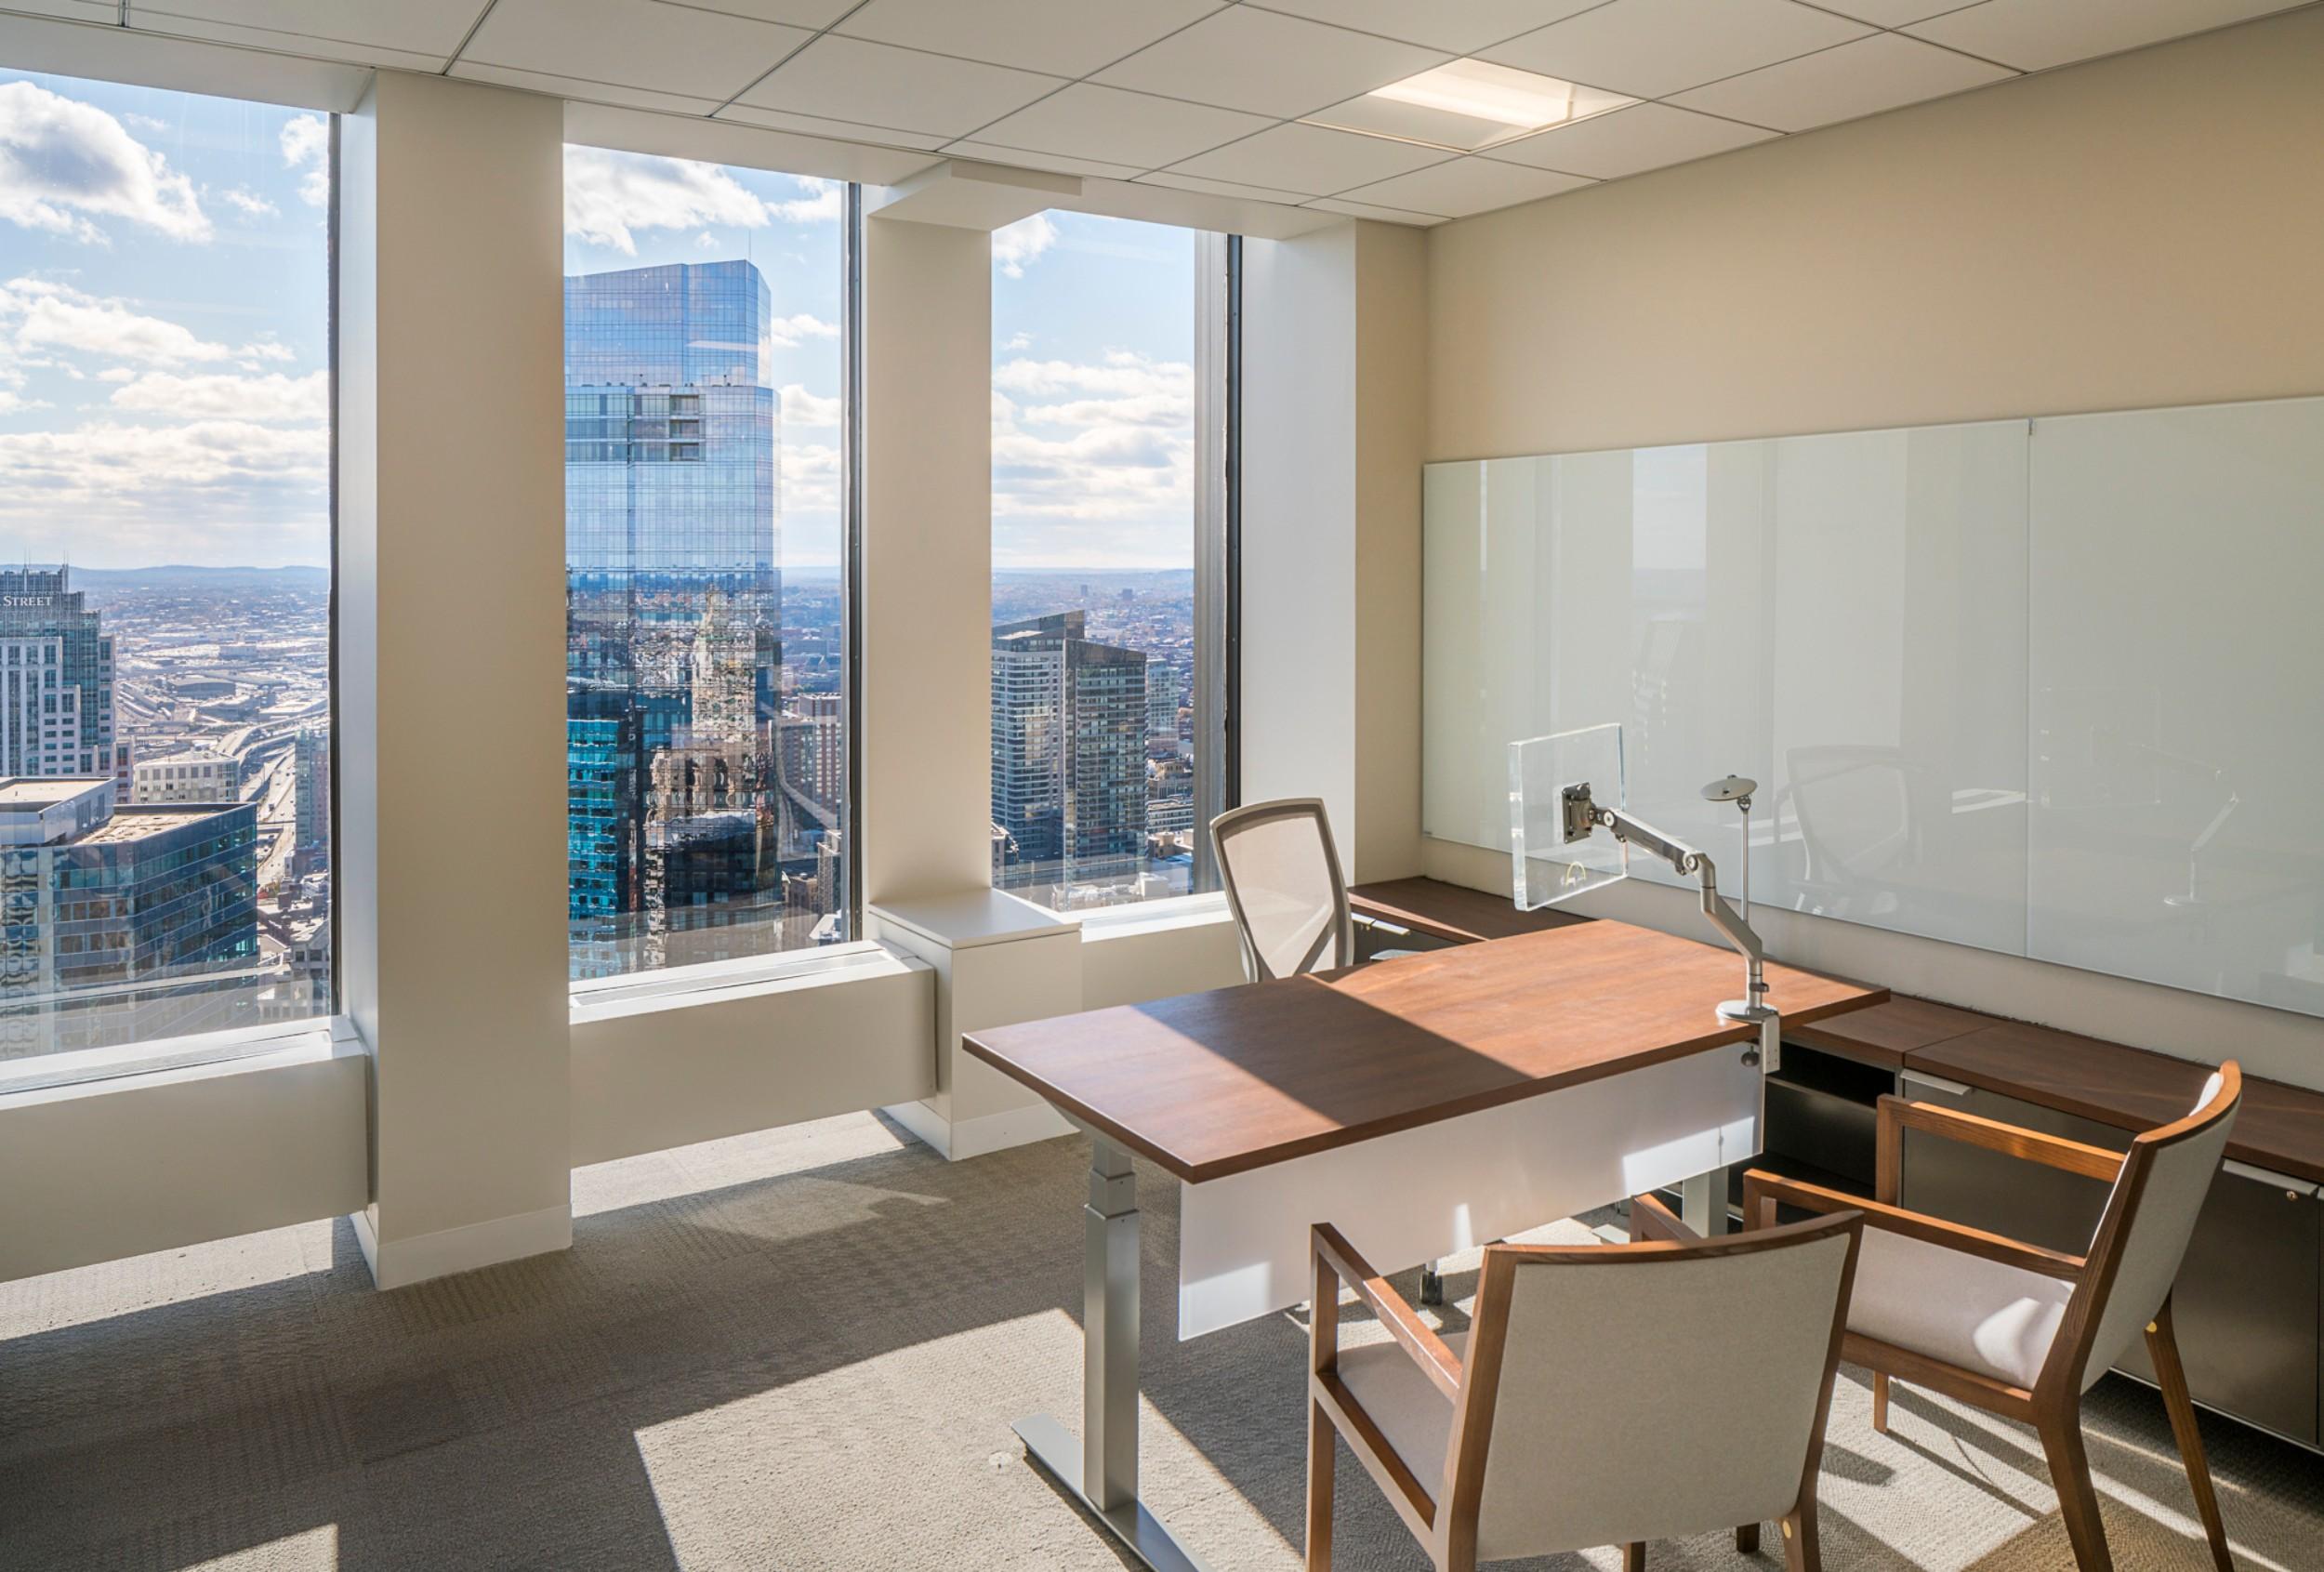 CBRE_Corderman_Construction_One_Boston_Place_Interior_Office_Desk.jpg